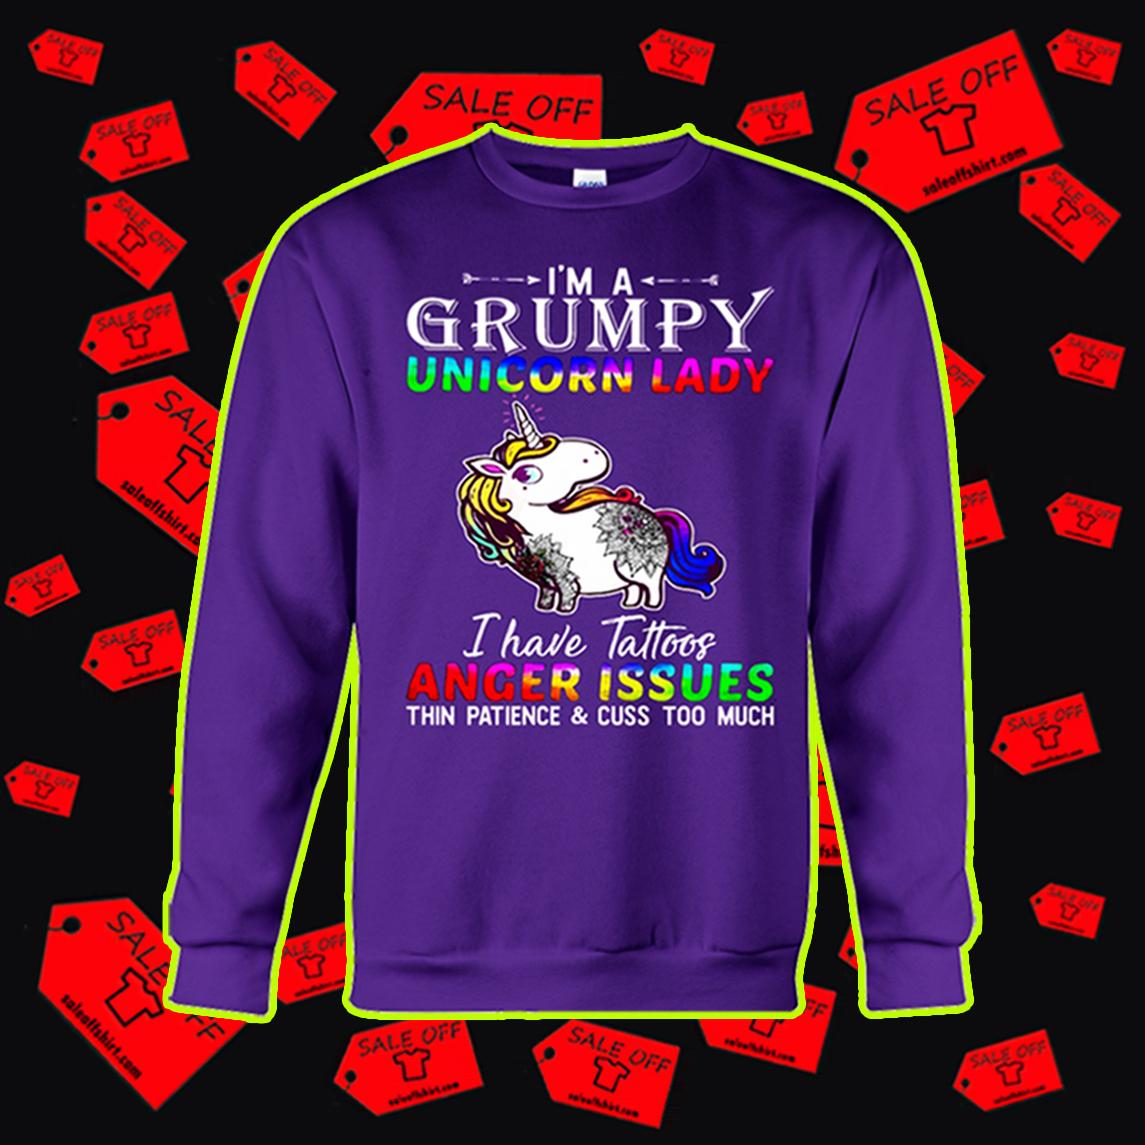 I'm a grumpy unicorn lady i have tattoos anger issues sweatshirt